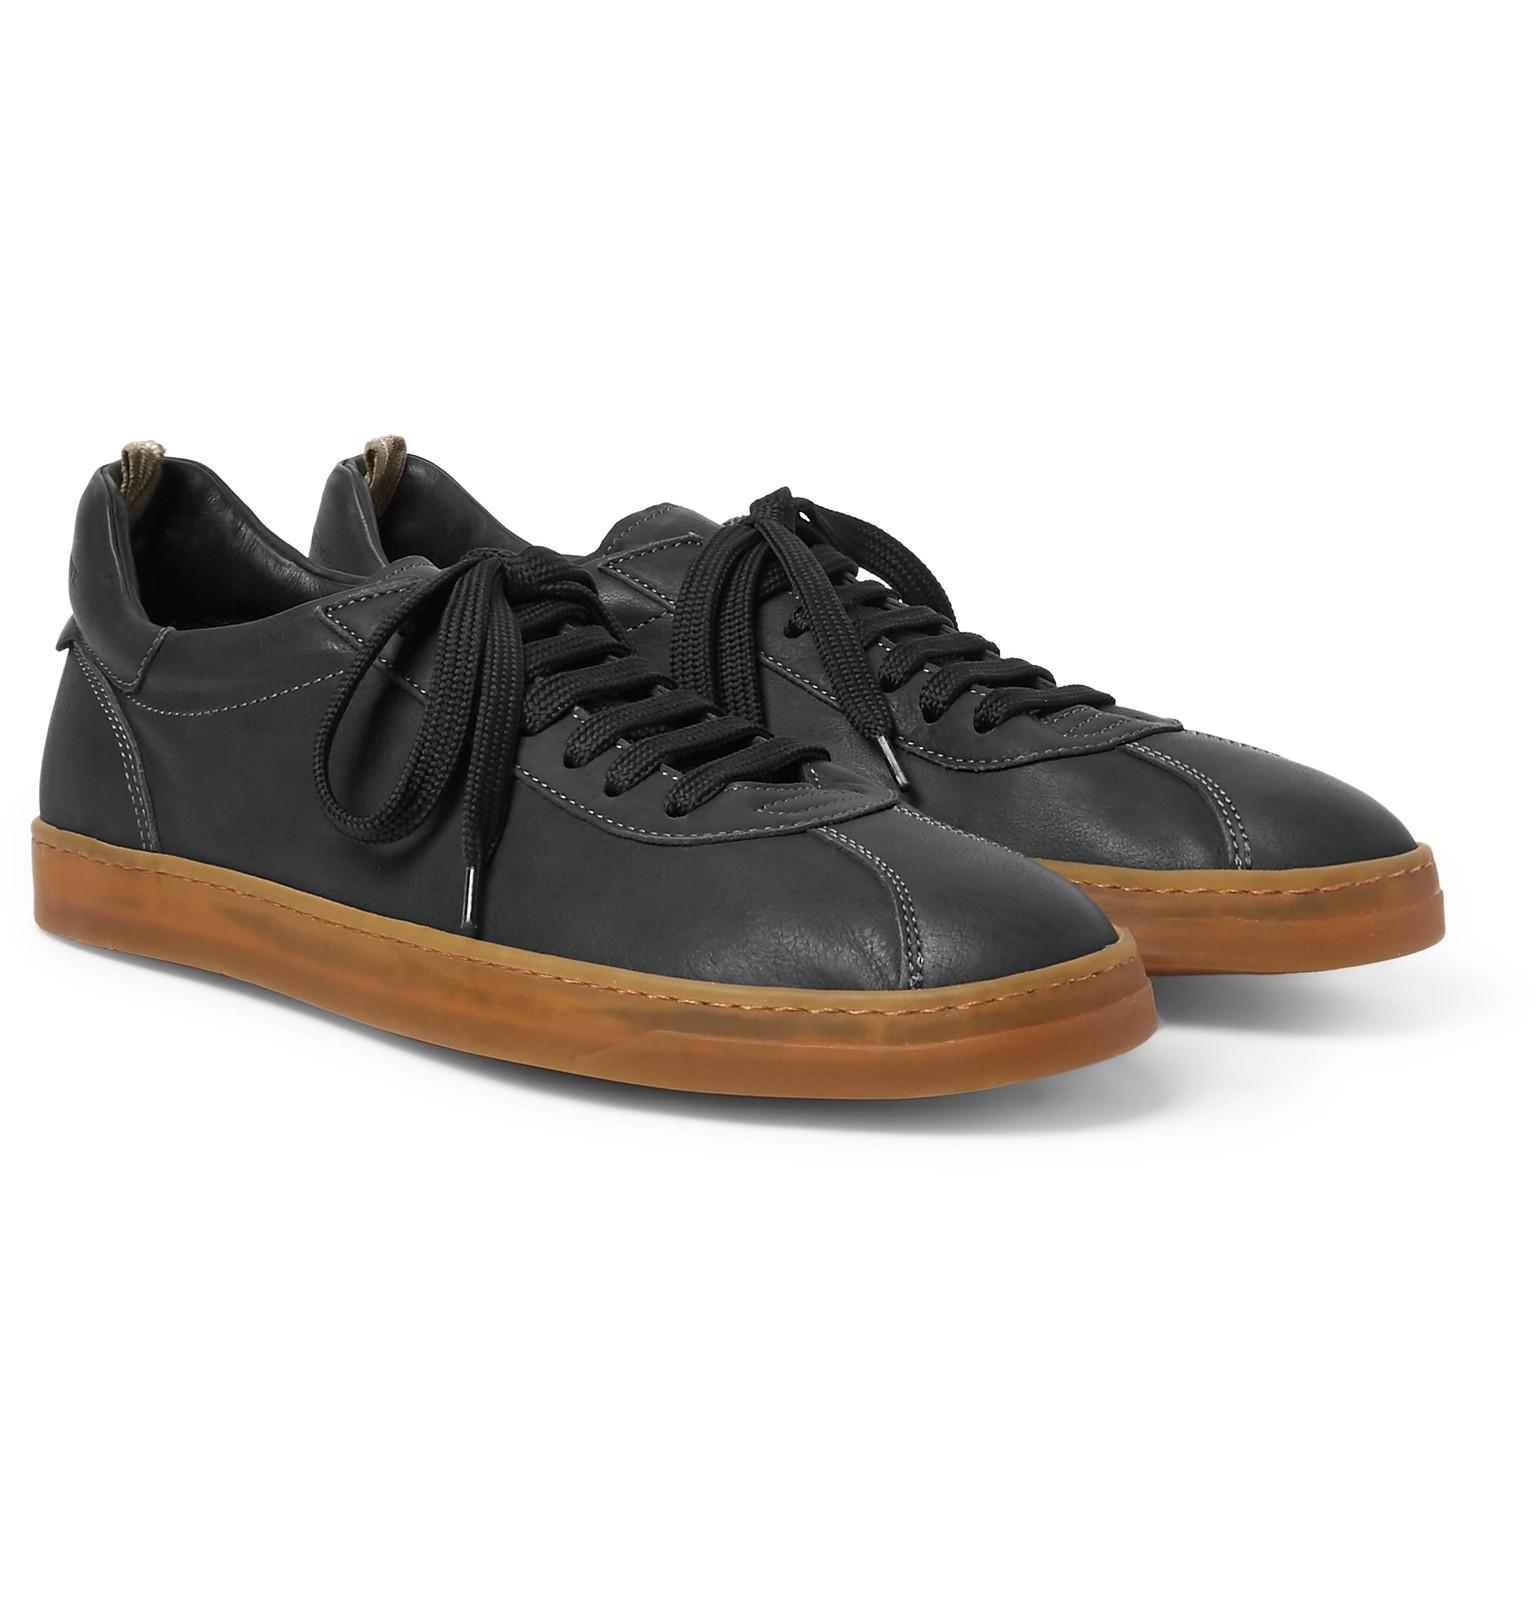 Karma Full-grain Leather Sneakers - Off-whiteOfficine Creative GJNNlKxpkh